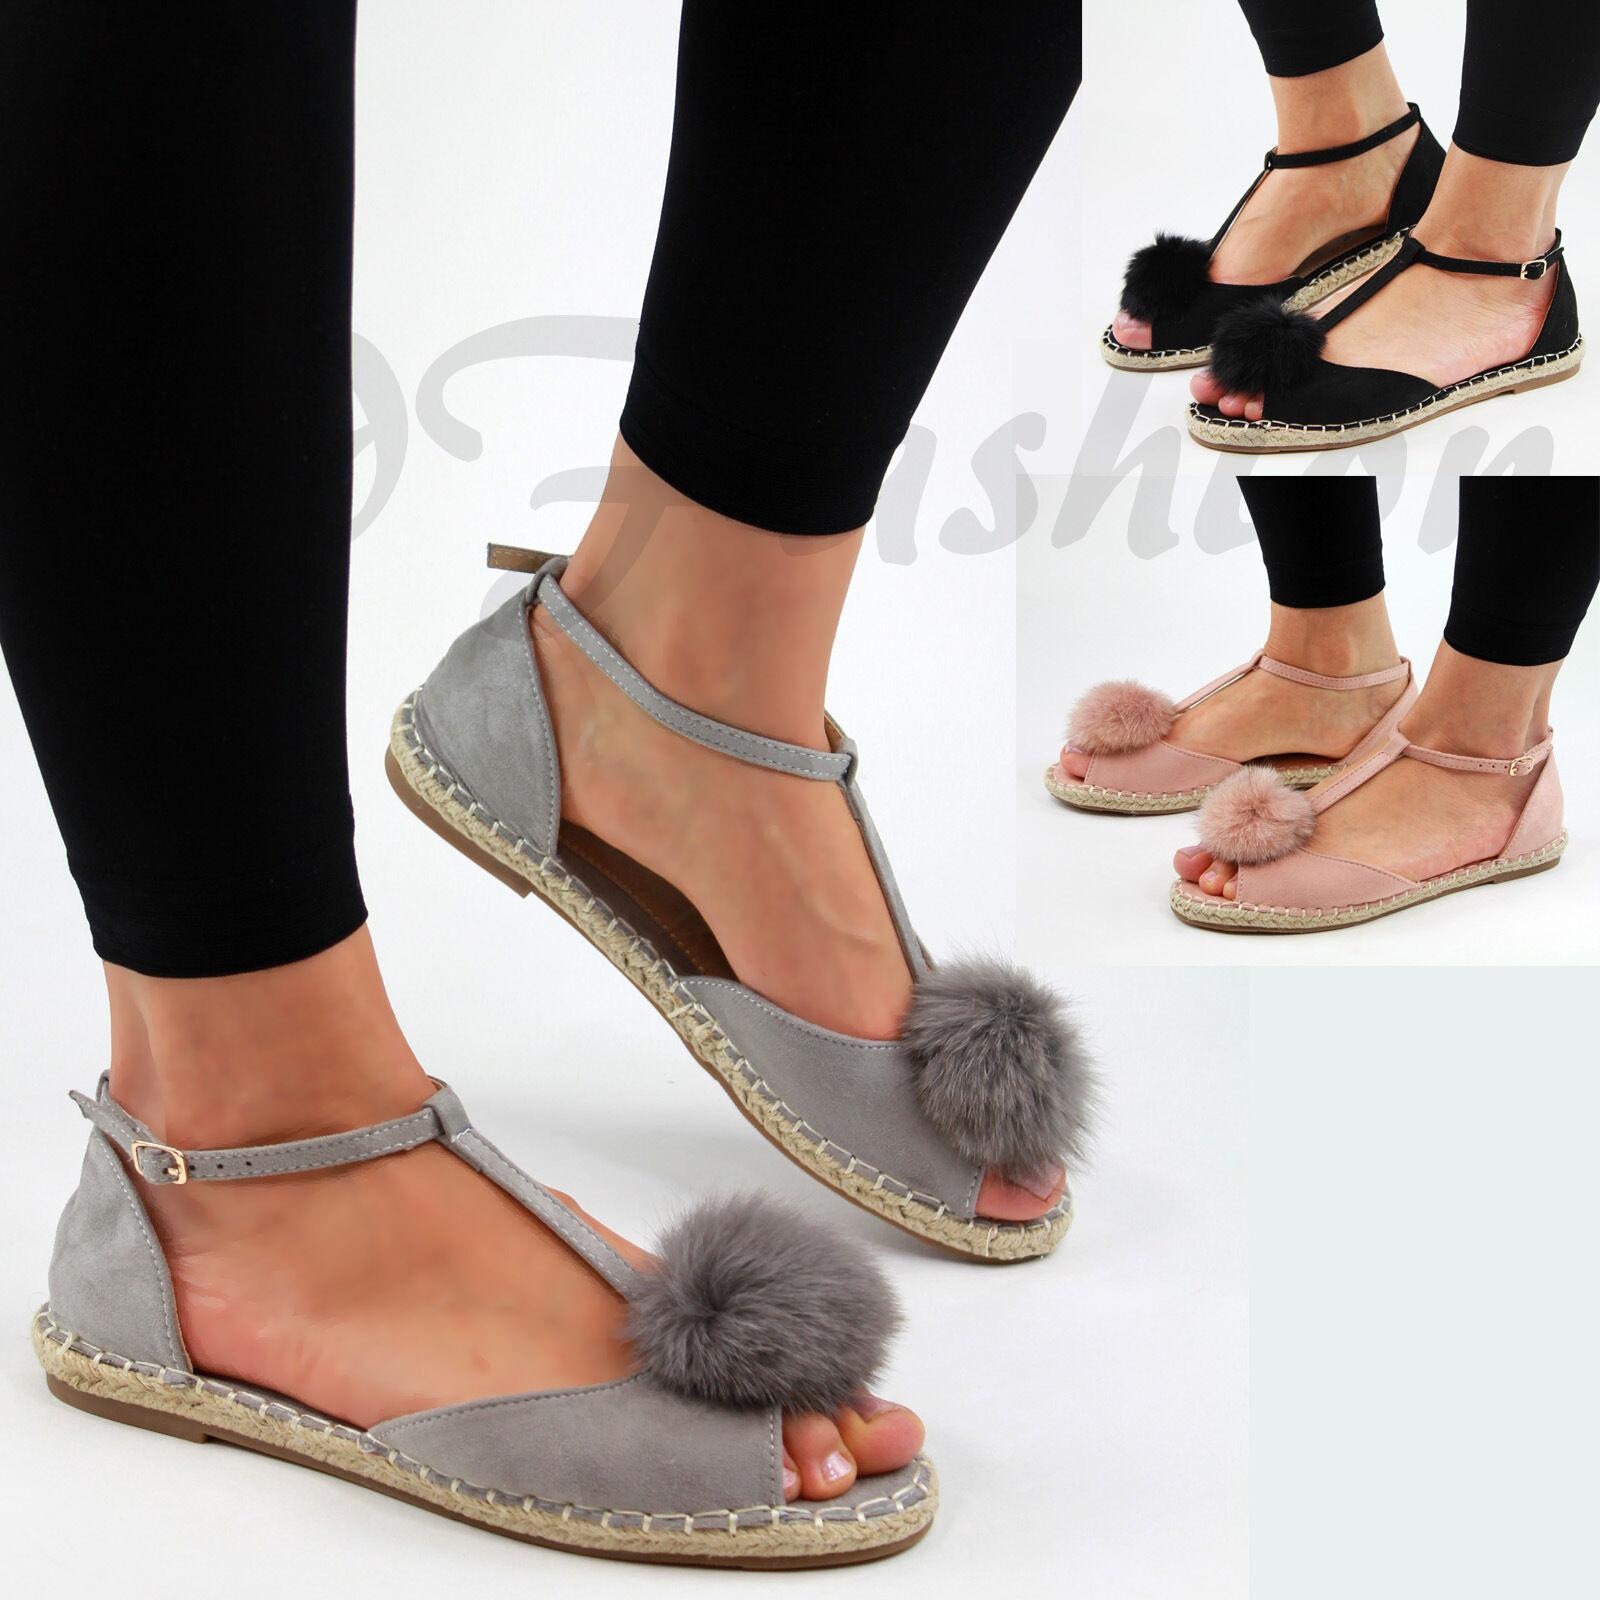 New Womens Fur Toe Pom Pom Espadrilles Peep Toe Fur Sandals Ankle Strap T-Bar Flat Shoes f2a4ab